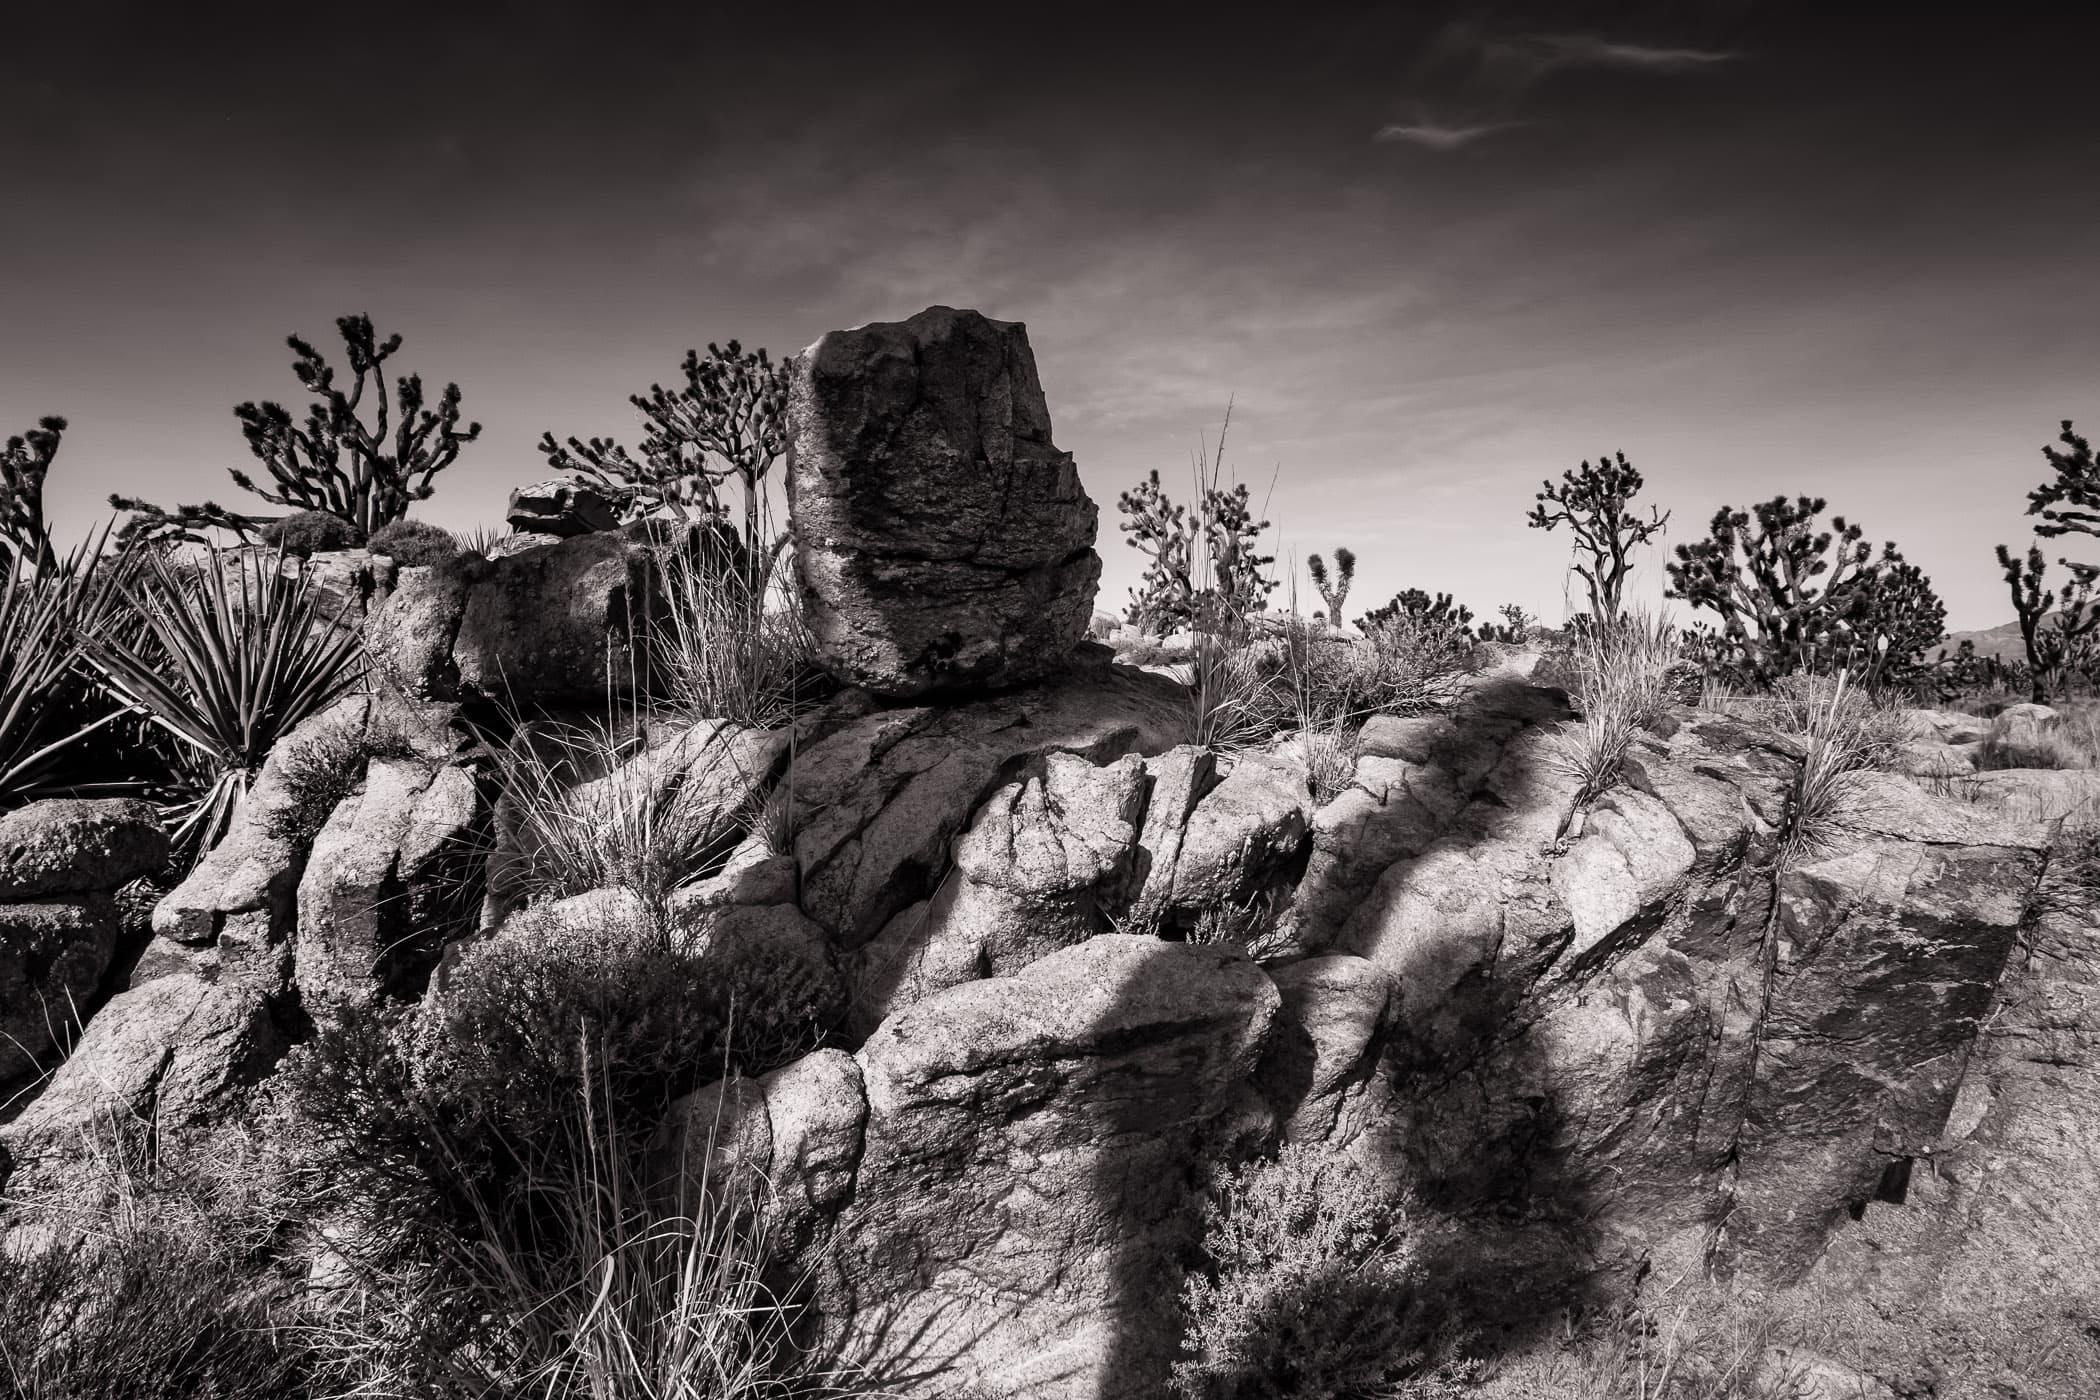 A Joshua tree casts as shadow on rocks at California's Mojave National Preserve.